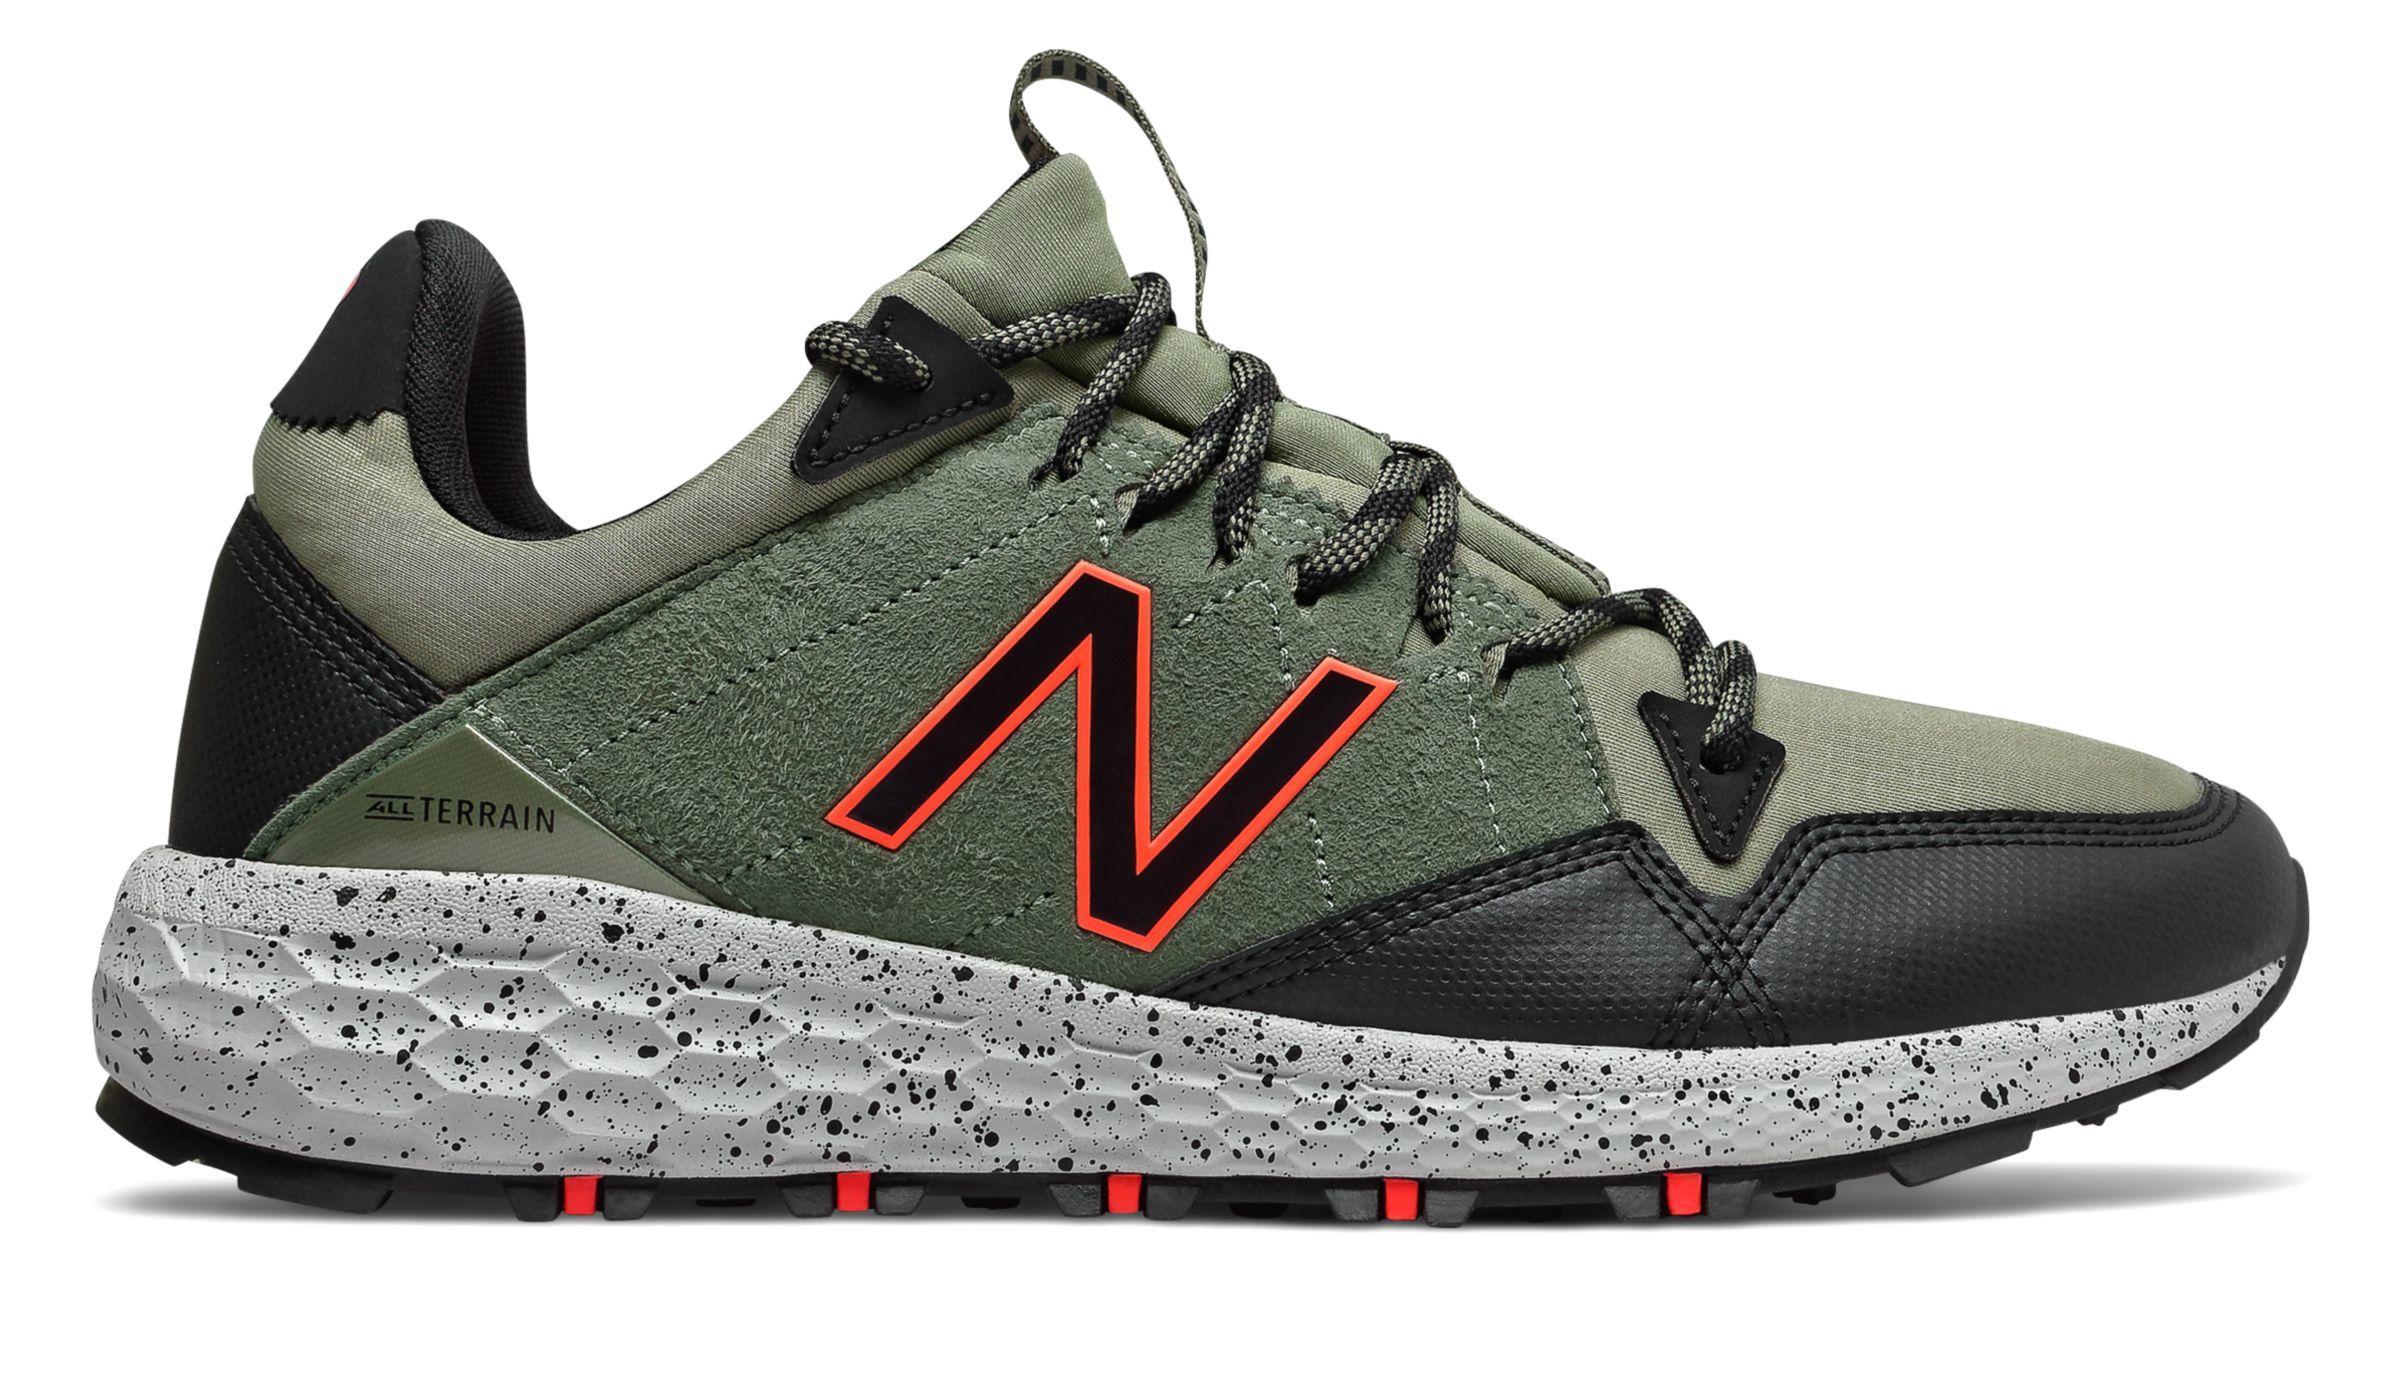 New Balance Men S Fresh Foam Crag Trail Shoes Green With Black New Balance Trail Shoes Hiking Shoes Mens